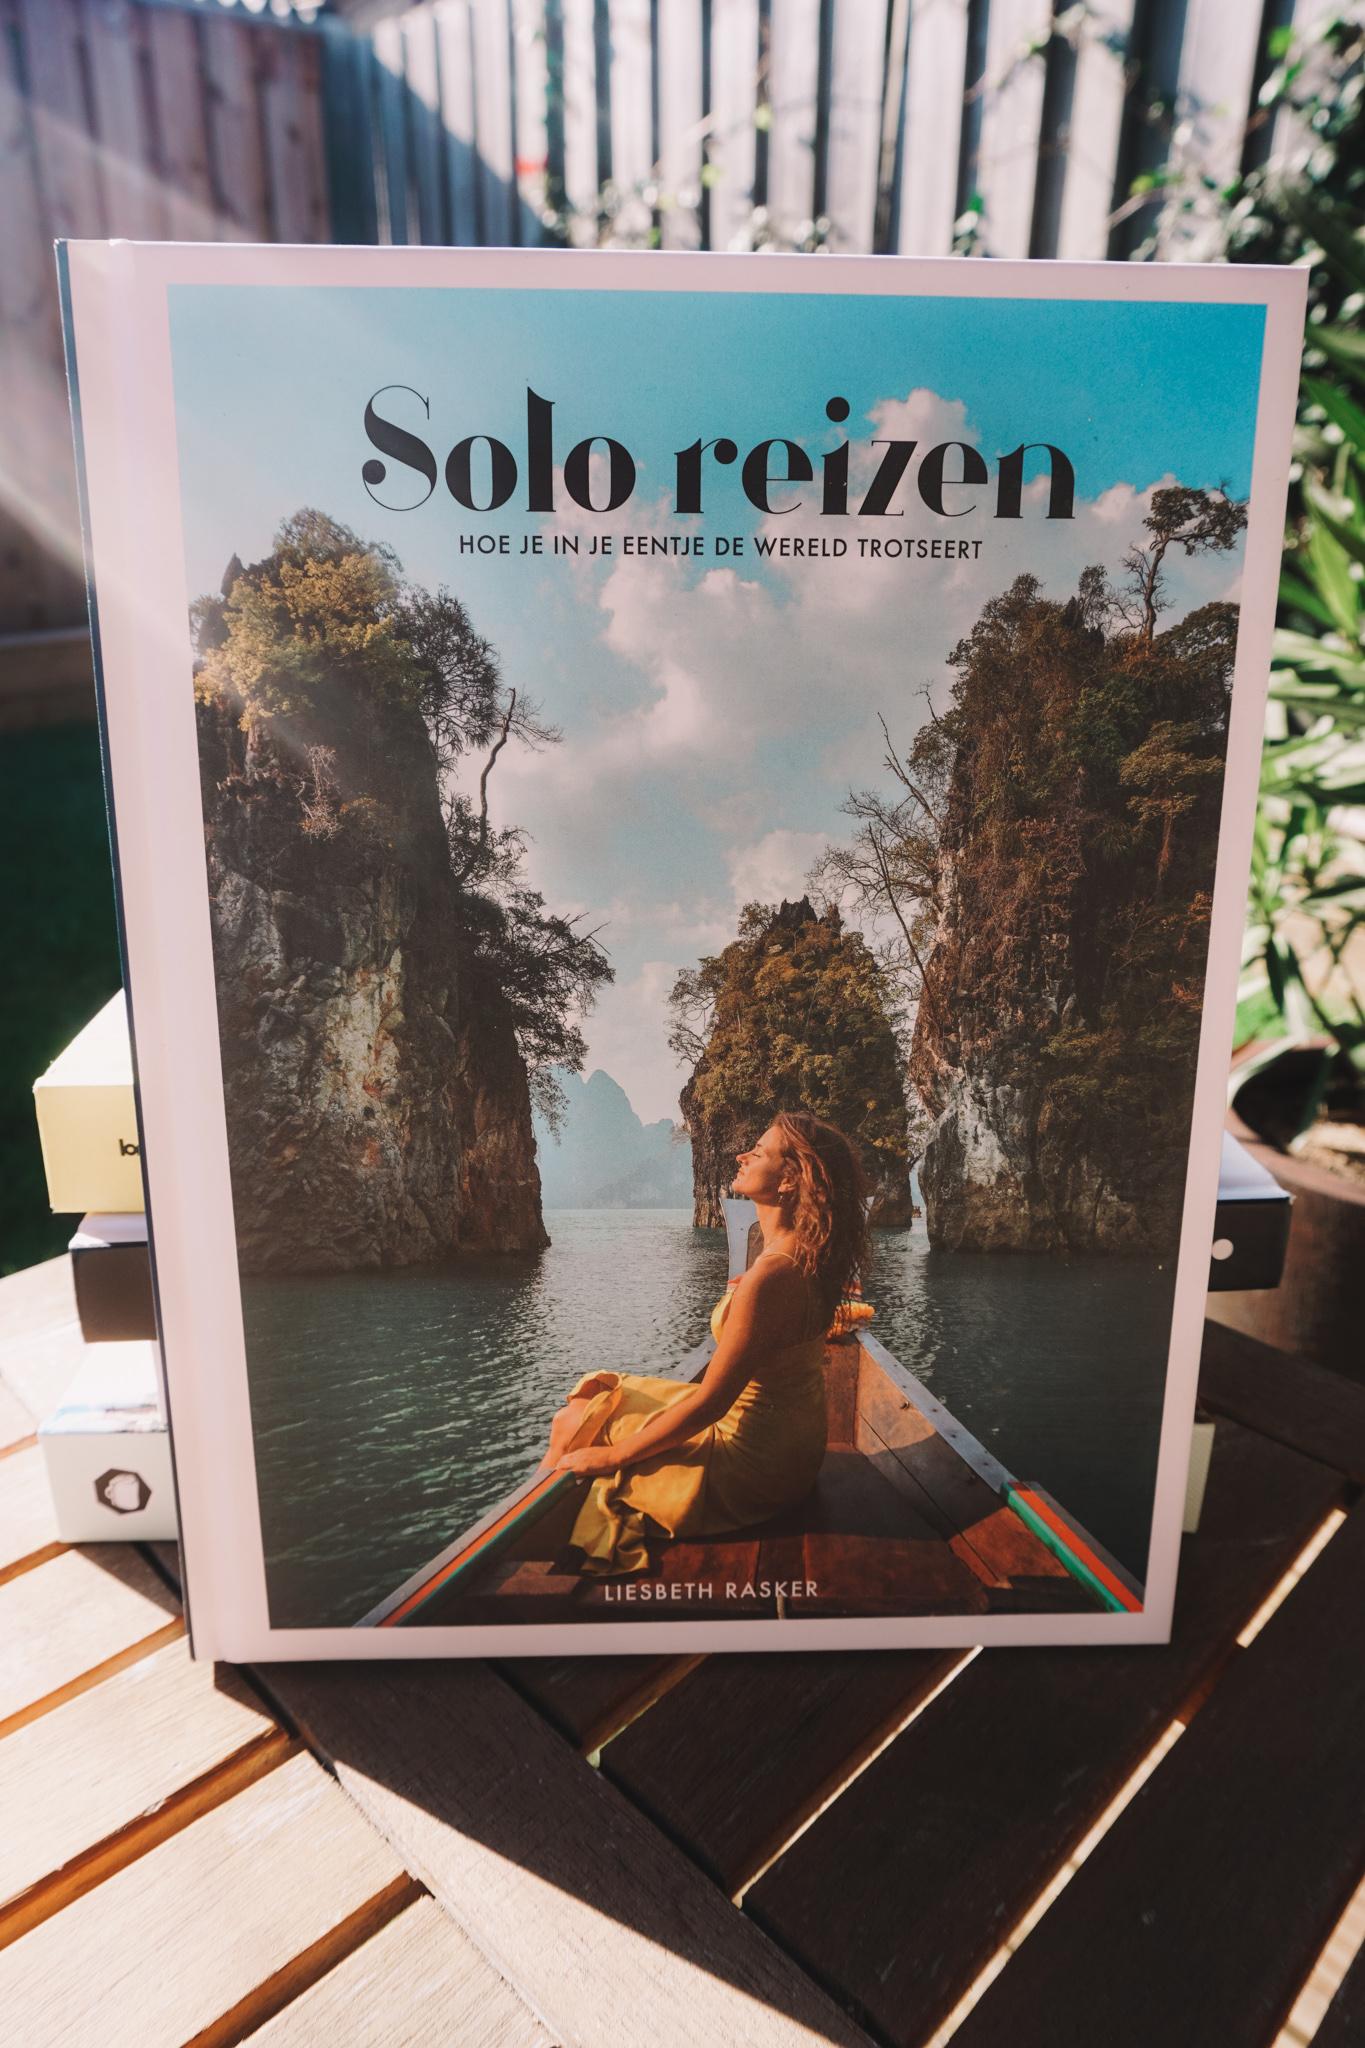 the ultimate travel books to read for travel inspiration, english travel books, dutch travel books, solo reizen, liesbeth rasker